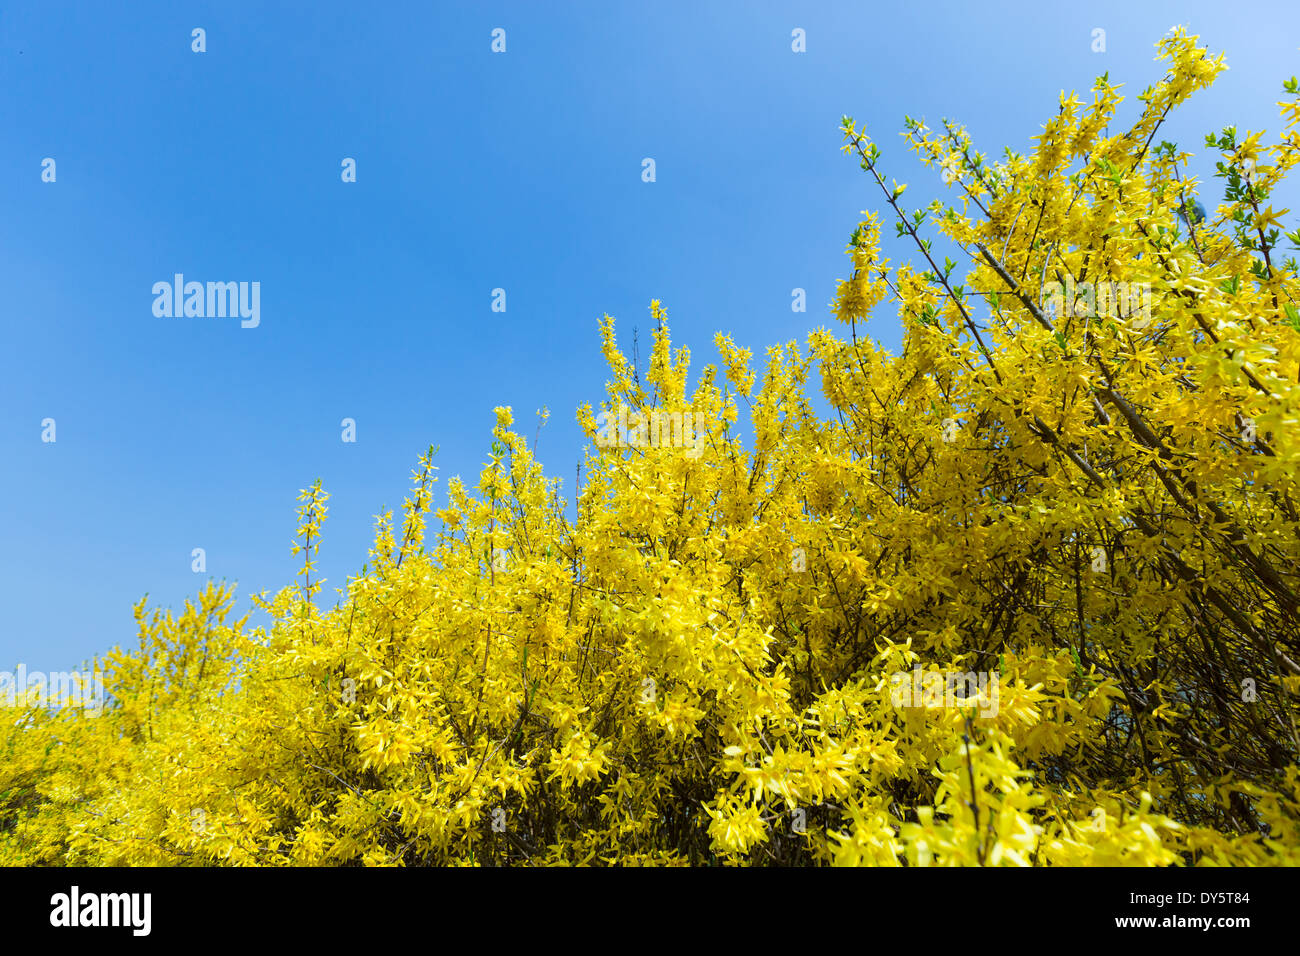 Spring time flower, Zlatý déšť, Laburnum alpinum, against blue sky - Stock Image